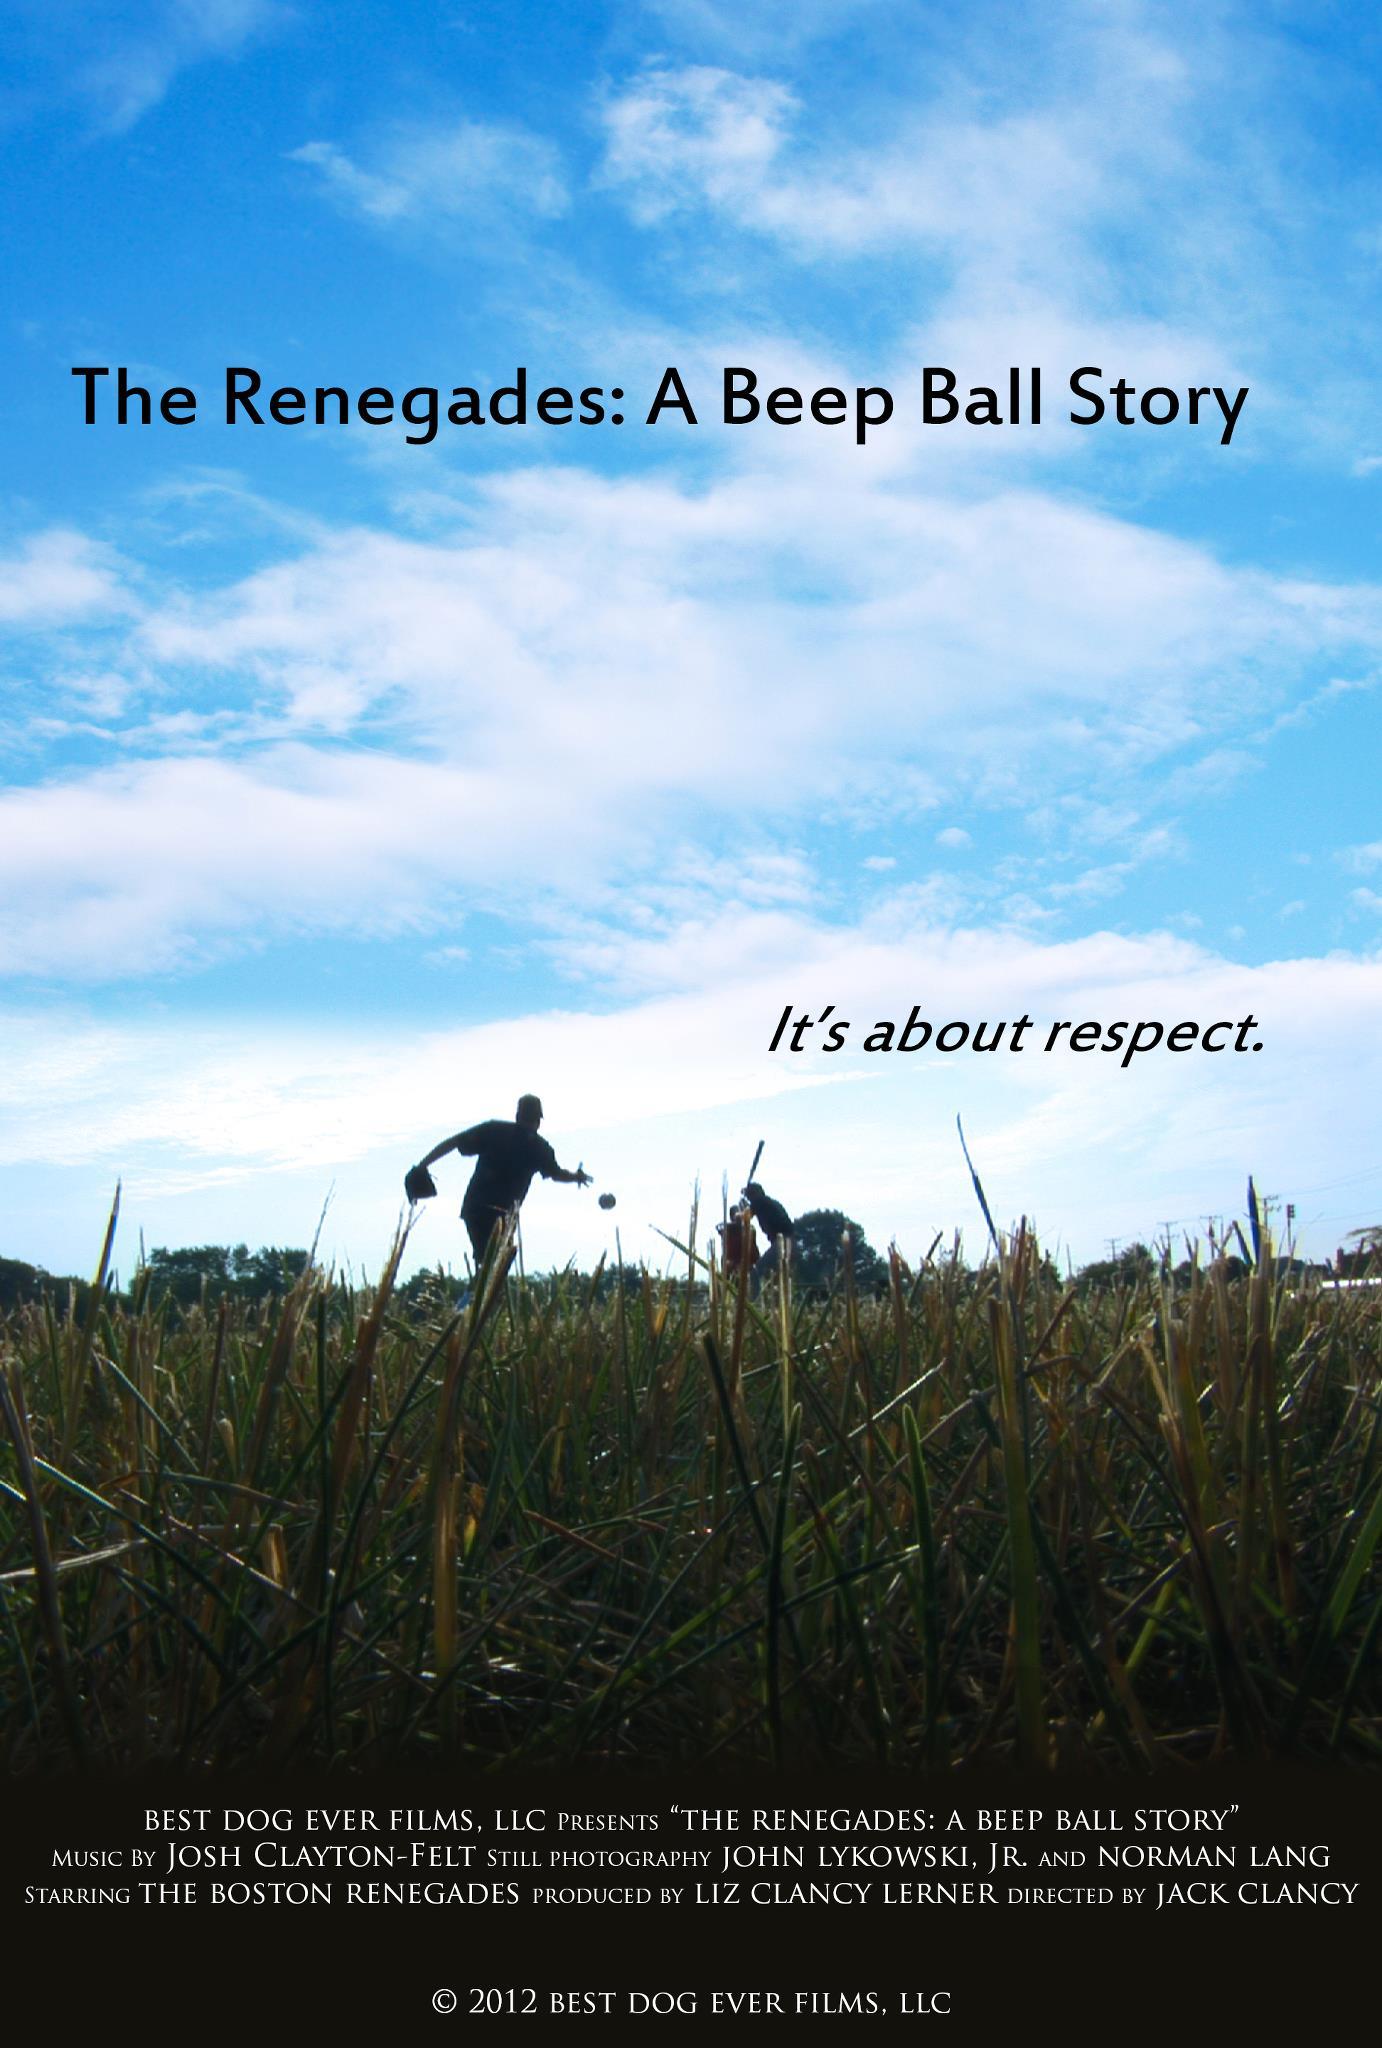 Renegade Movie Airing On June 8th In Woburn